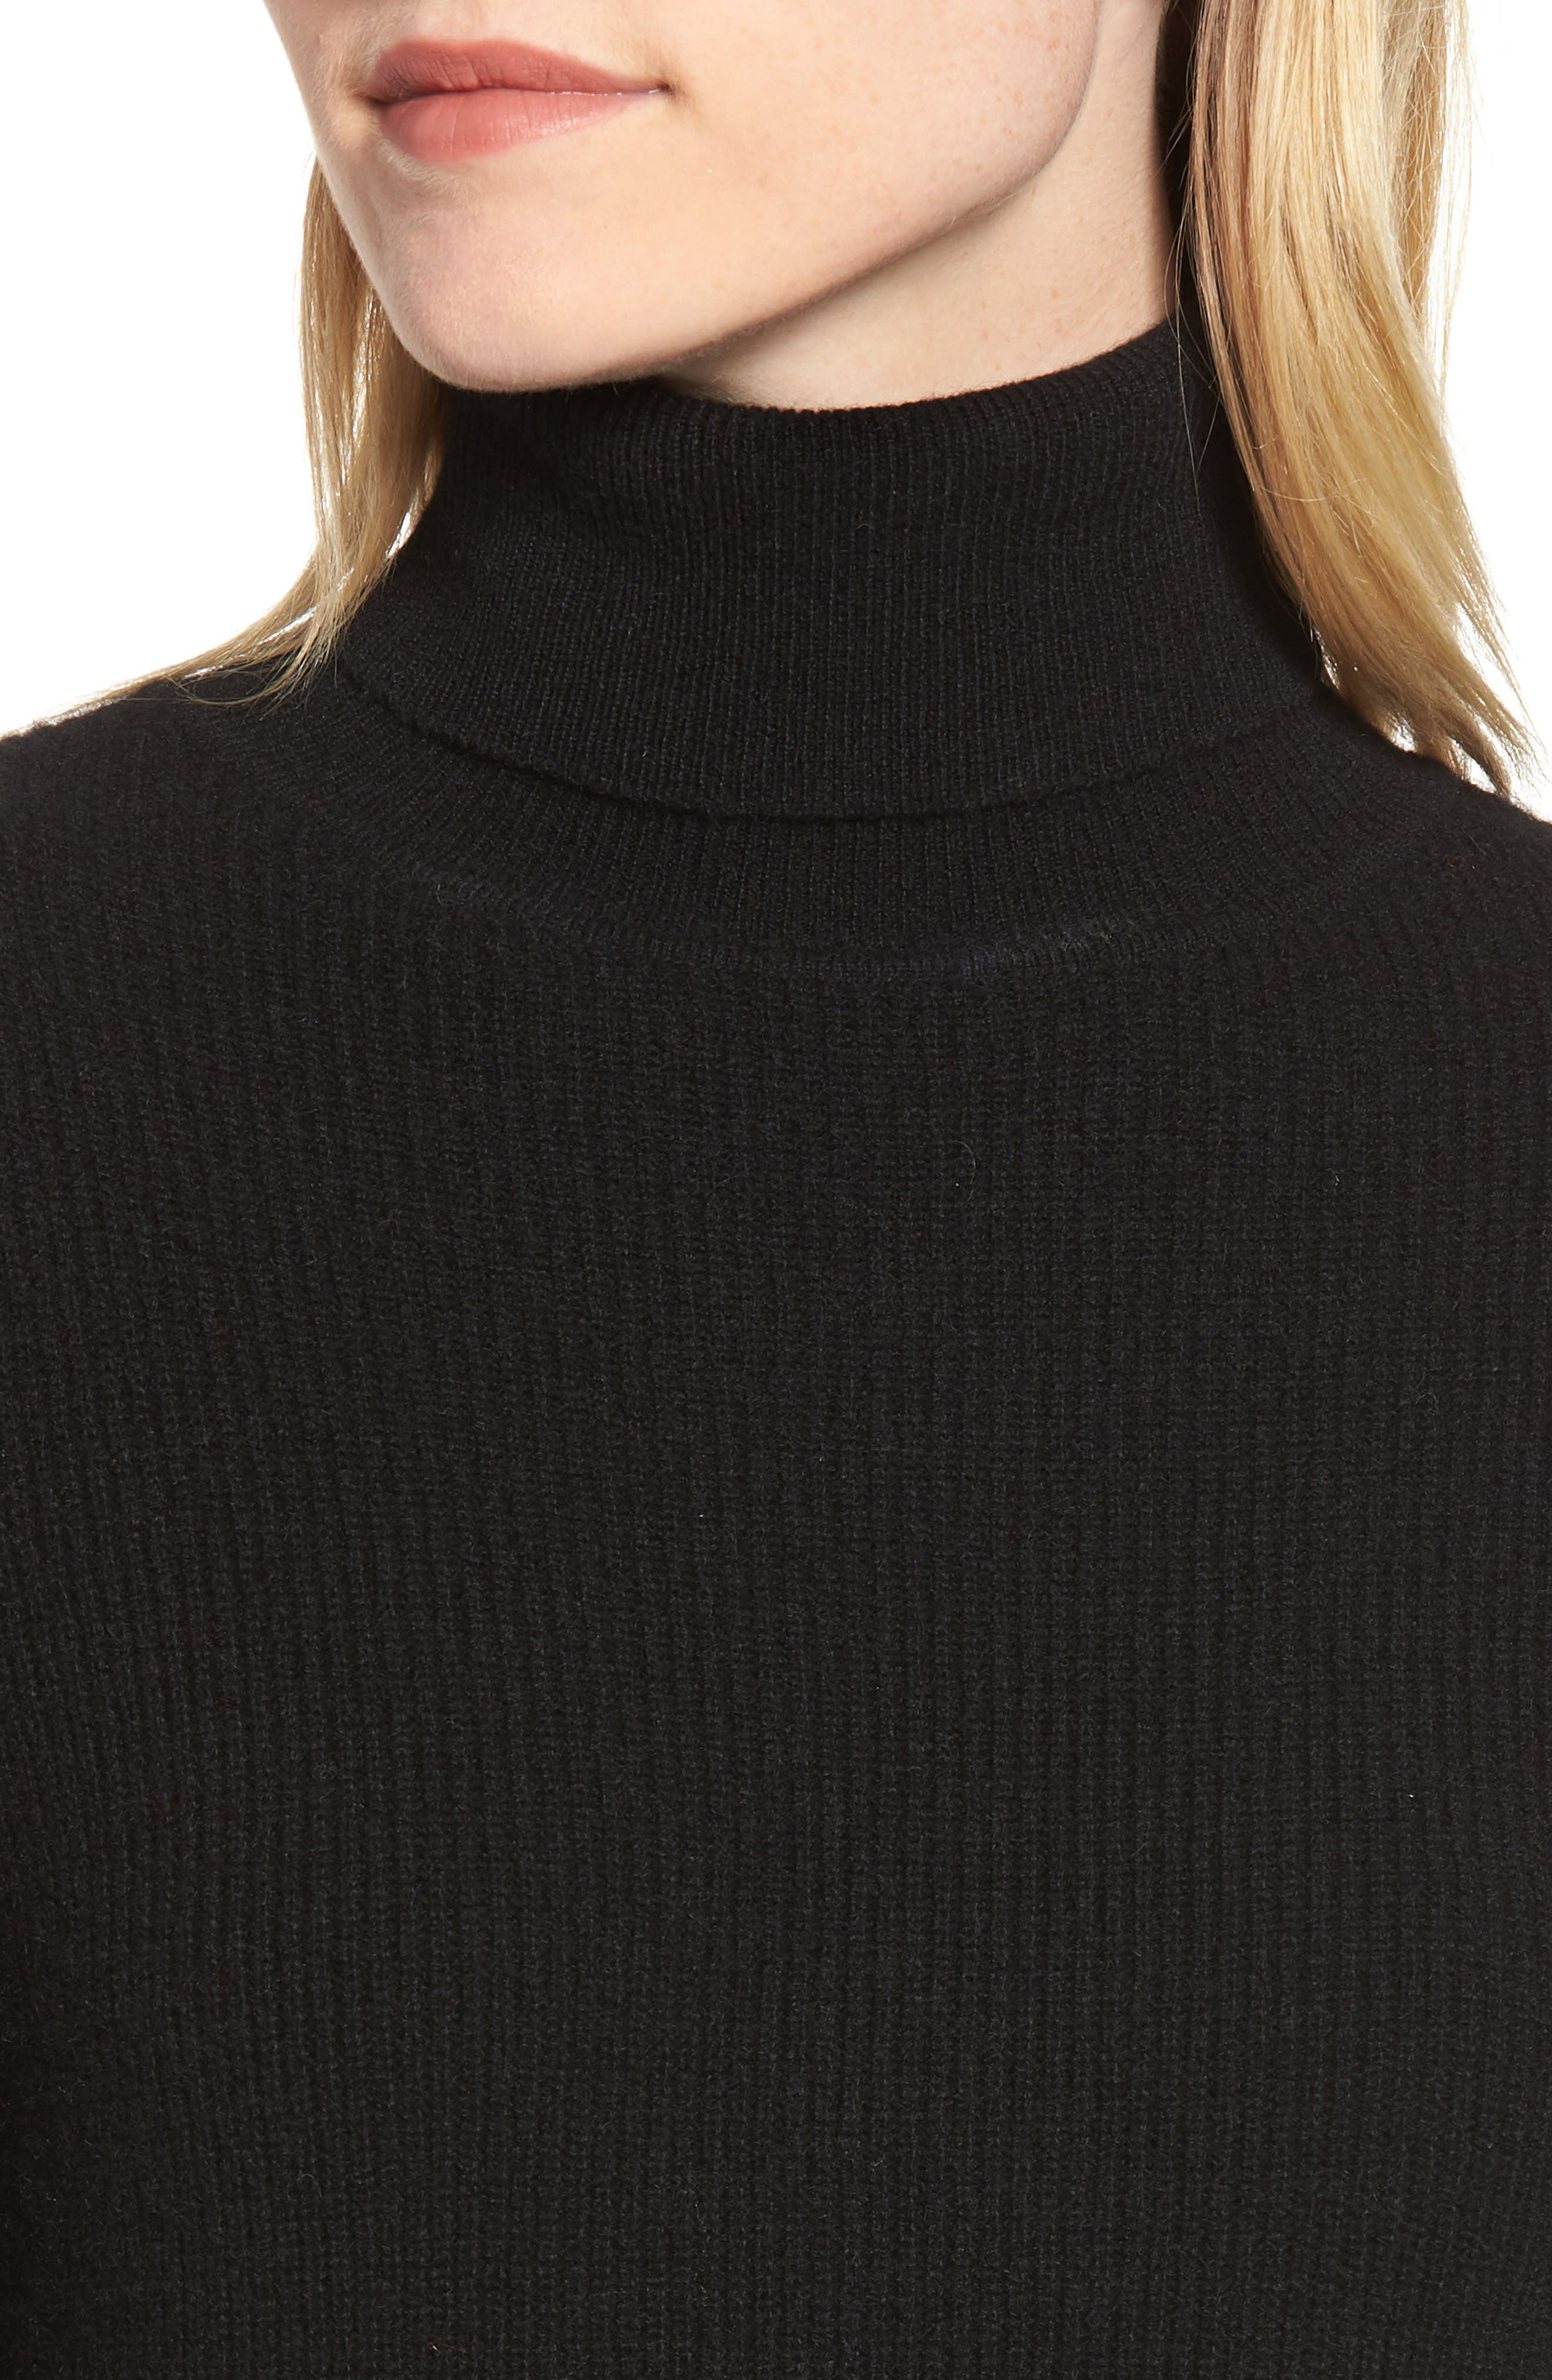 Cashmere Puff Sleeve Turtleneck,                             Alternate thumbnail 4, color,                             BLACK